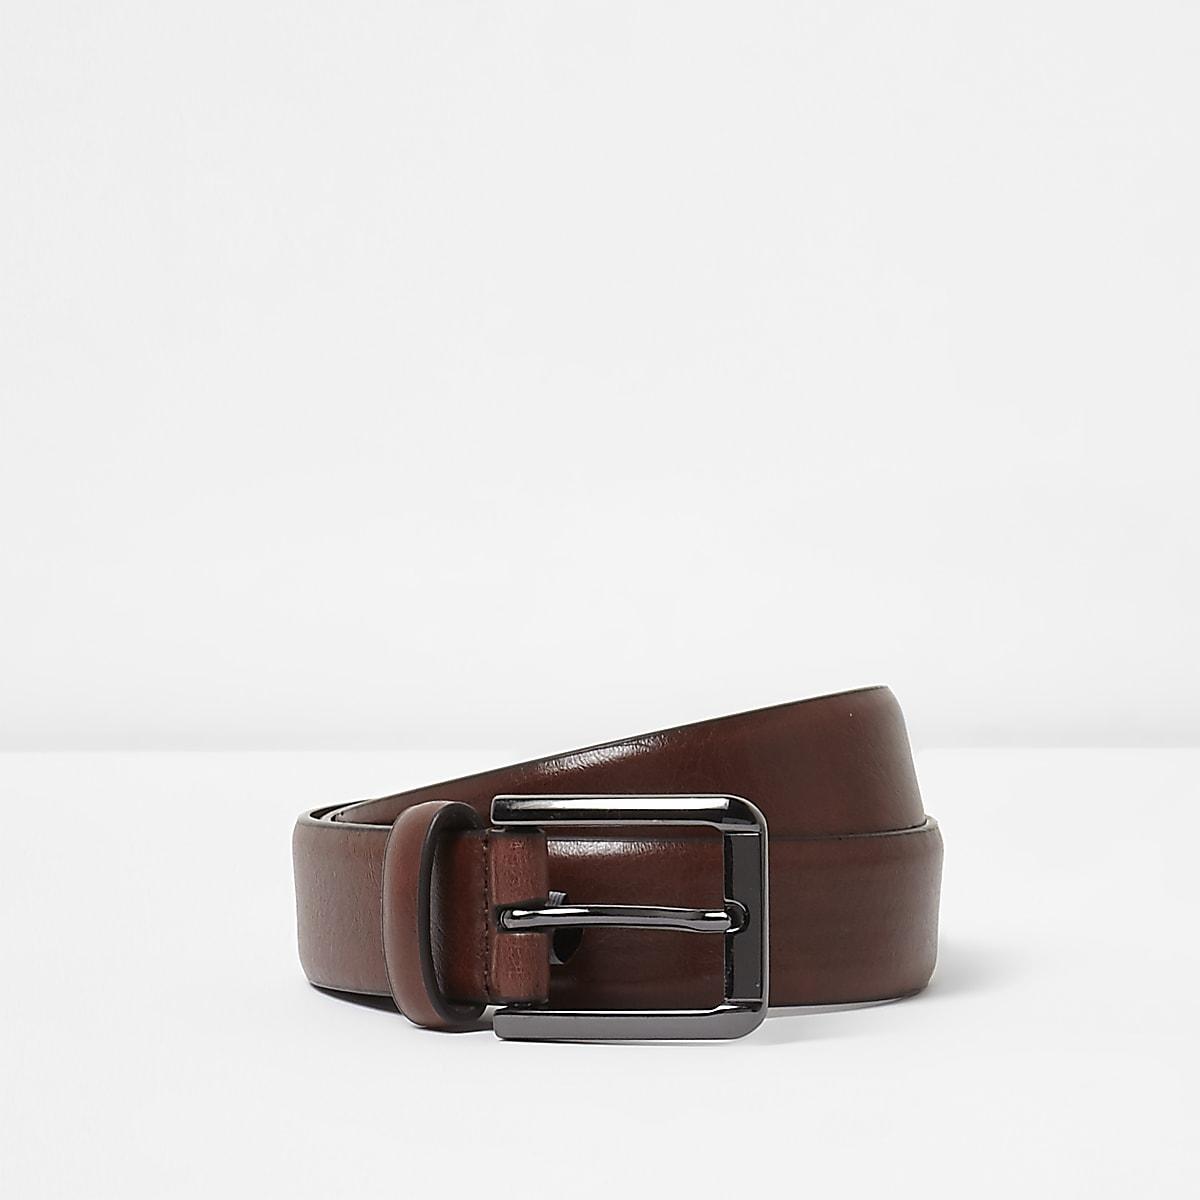 Tan smart belt